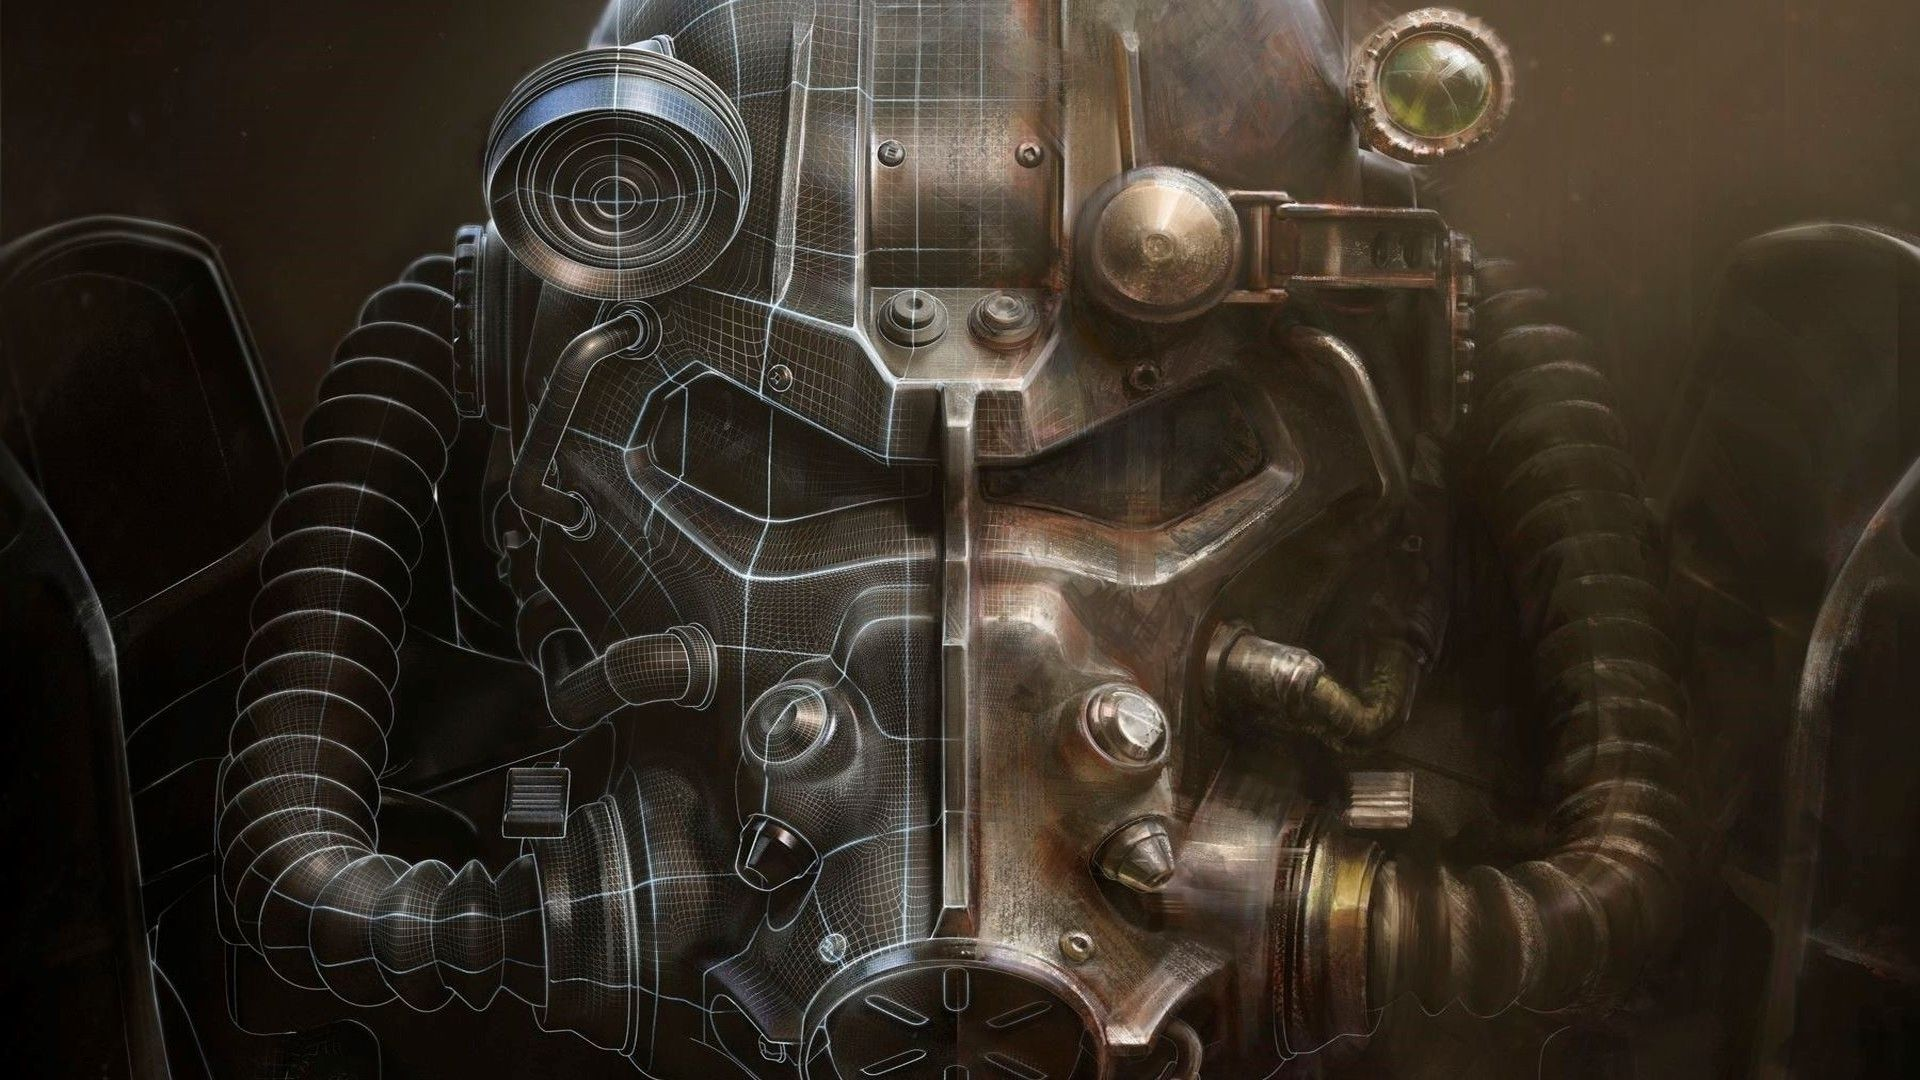 4k Fallout 4 Wallpaper Fallout Wallpaper Fallout 4 Wallpapers Snowman Wallpaper